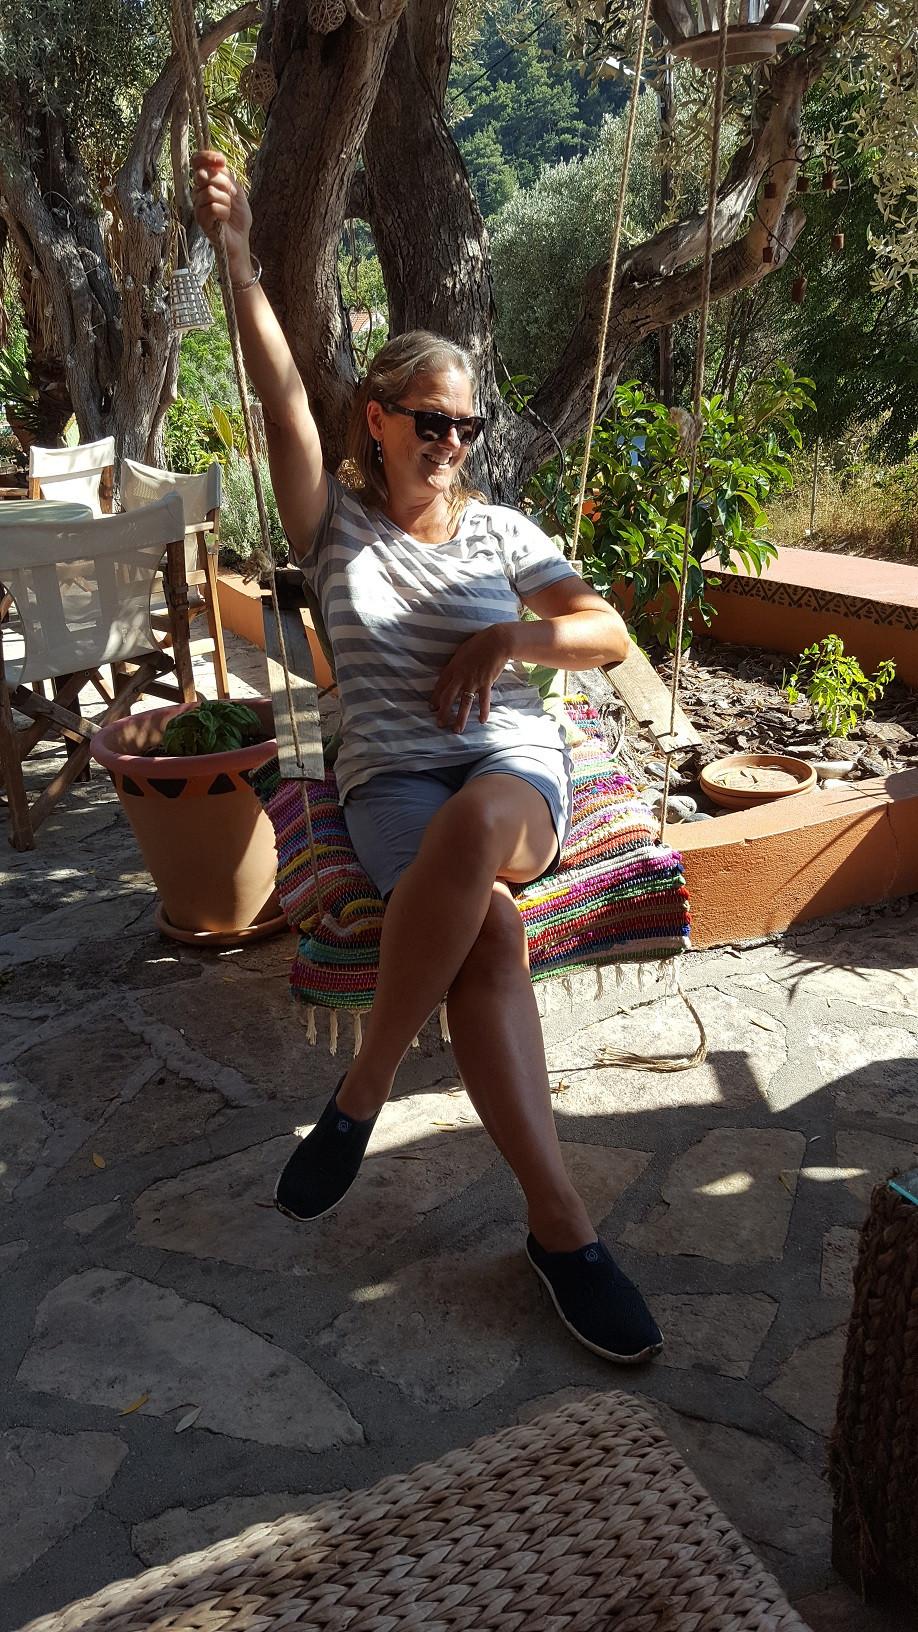 Aannsha on a swing